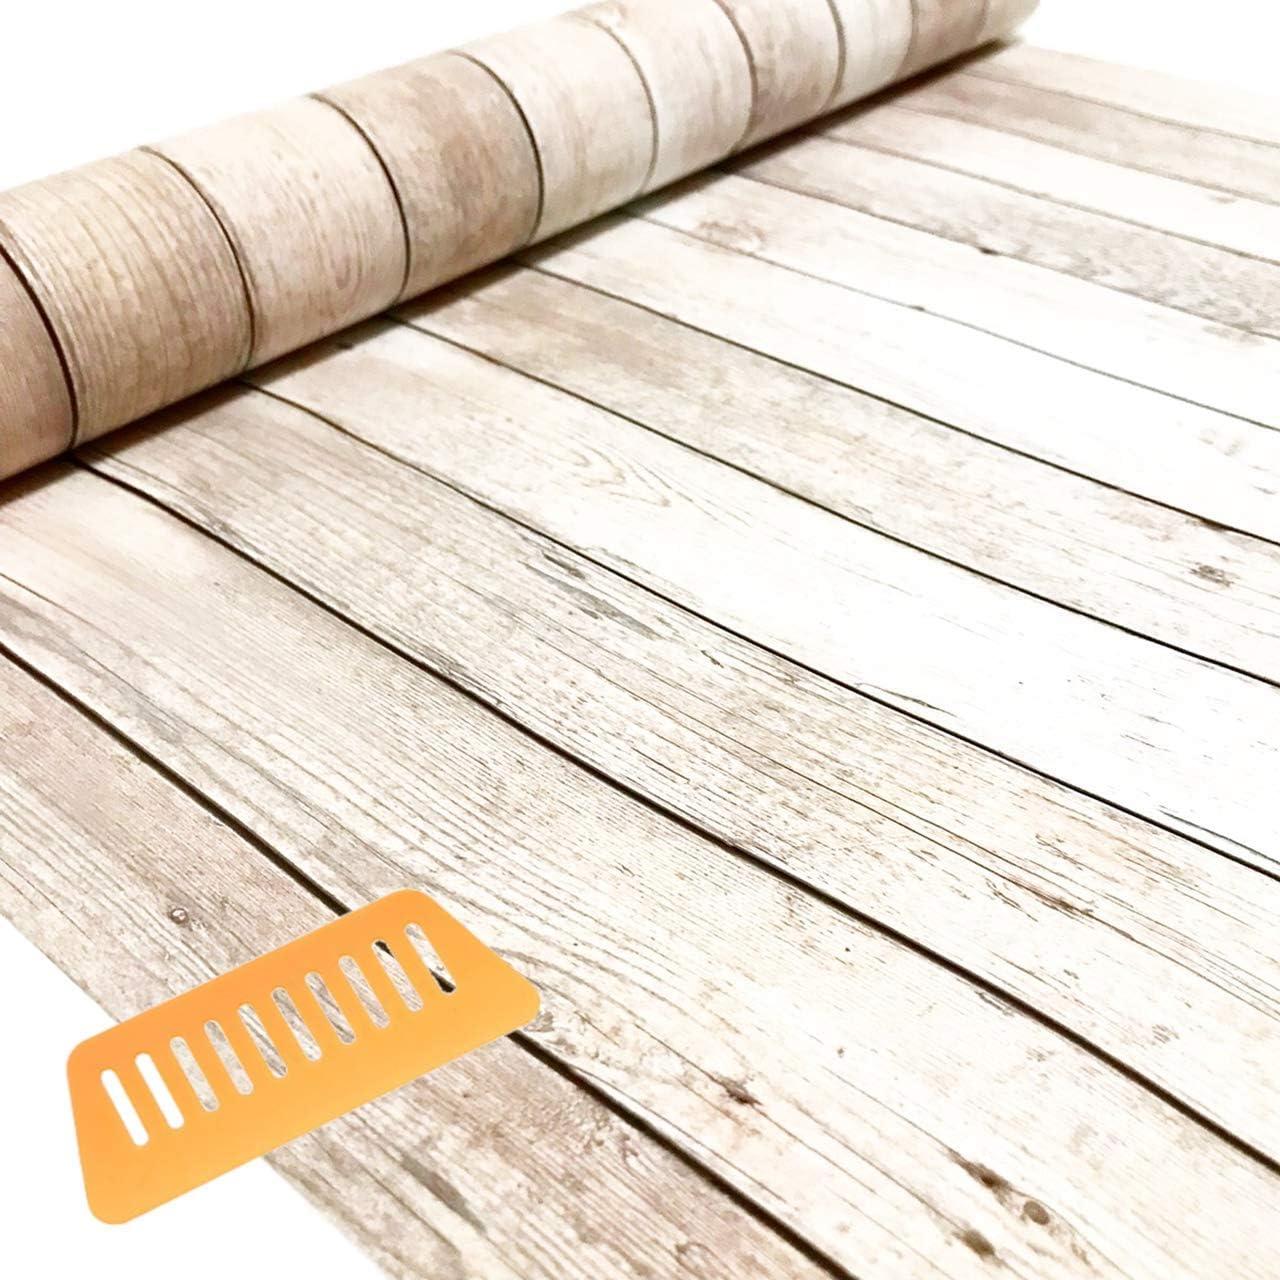 Amazon Gleood はがせる 防水 壁紙 シール クロス シート 45 Cm 幅 10 M 取付 道具 付 木目 アンティーク ホワイト 壁紙